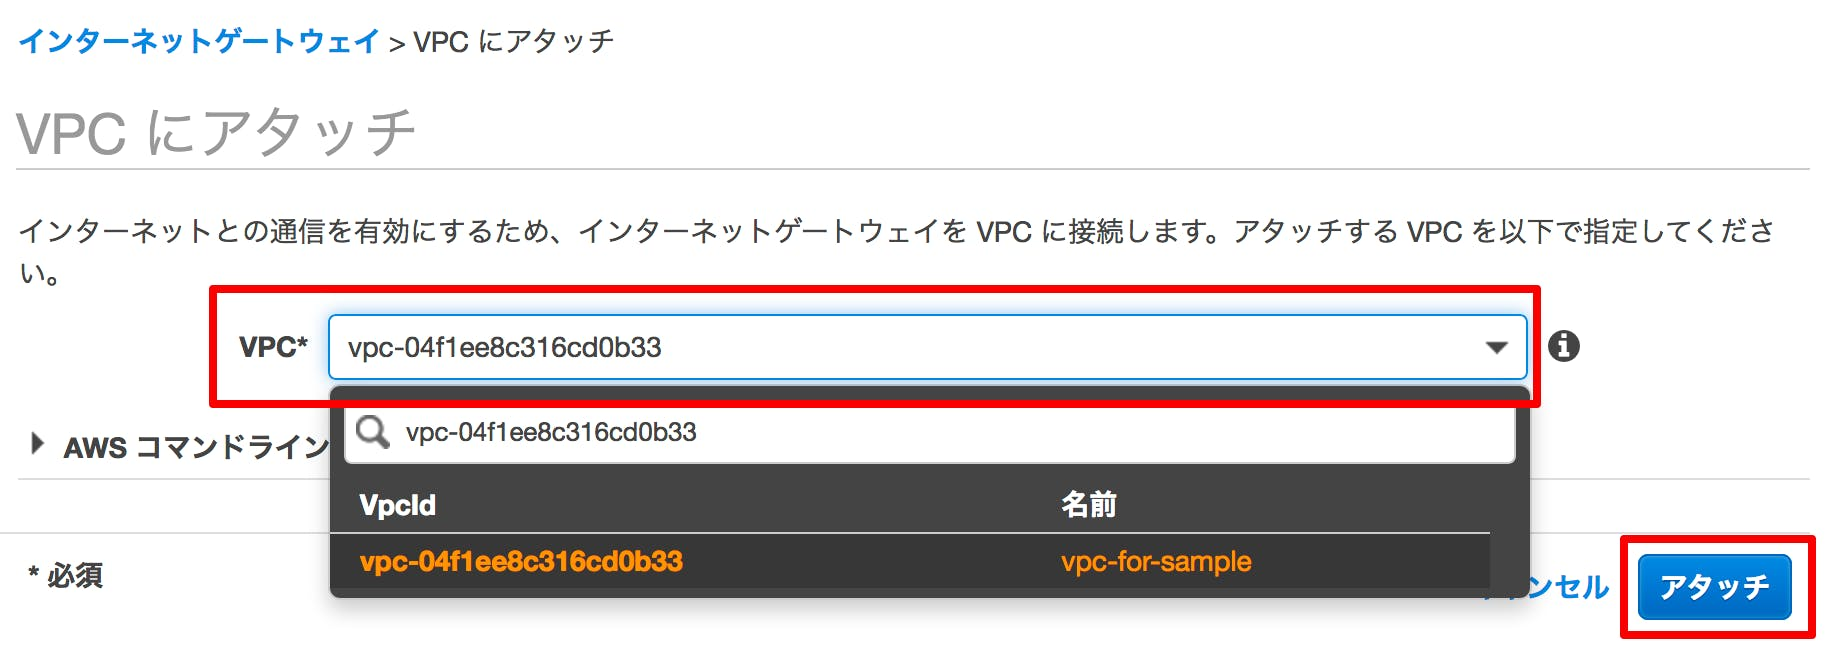 VPC にアタッチ   VPC Management Console_2018-12-11_19-52-40.png